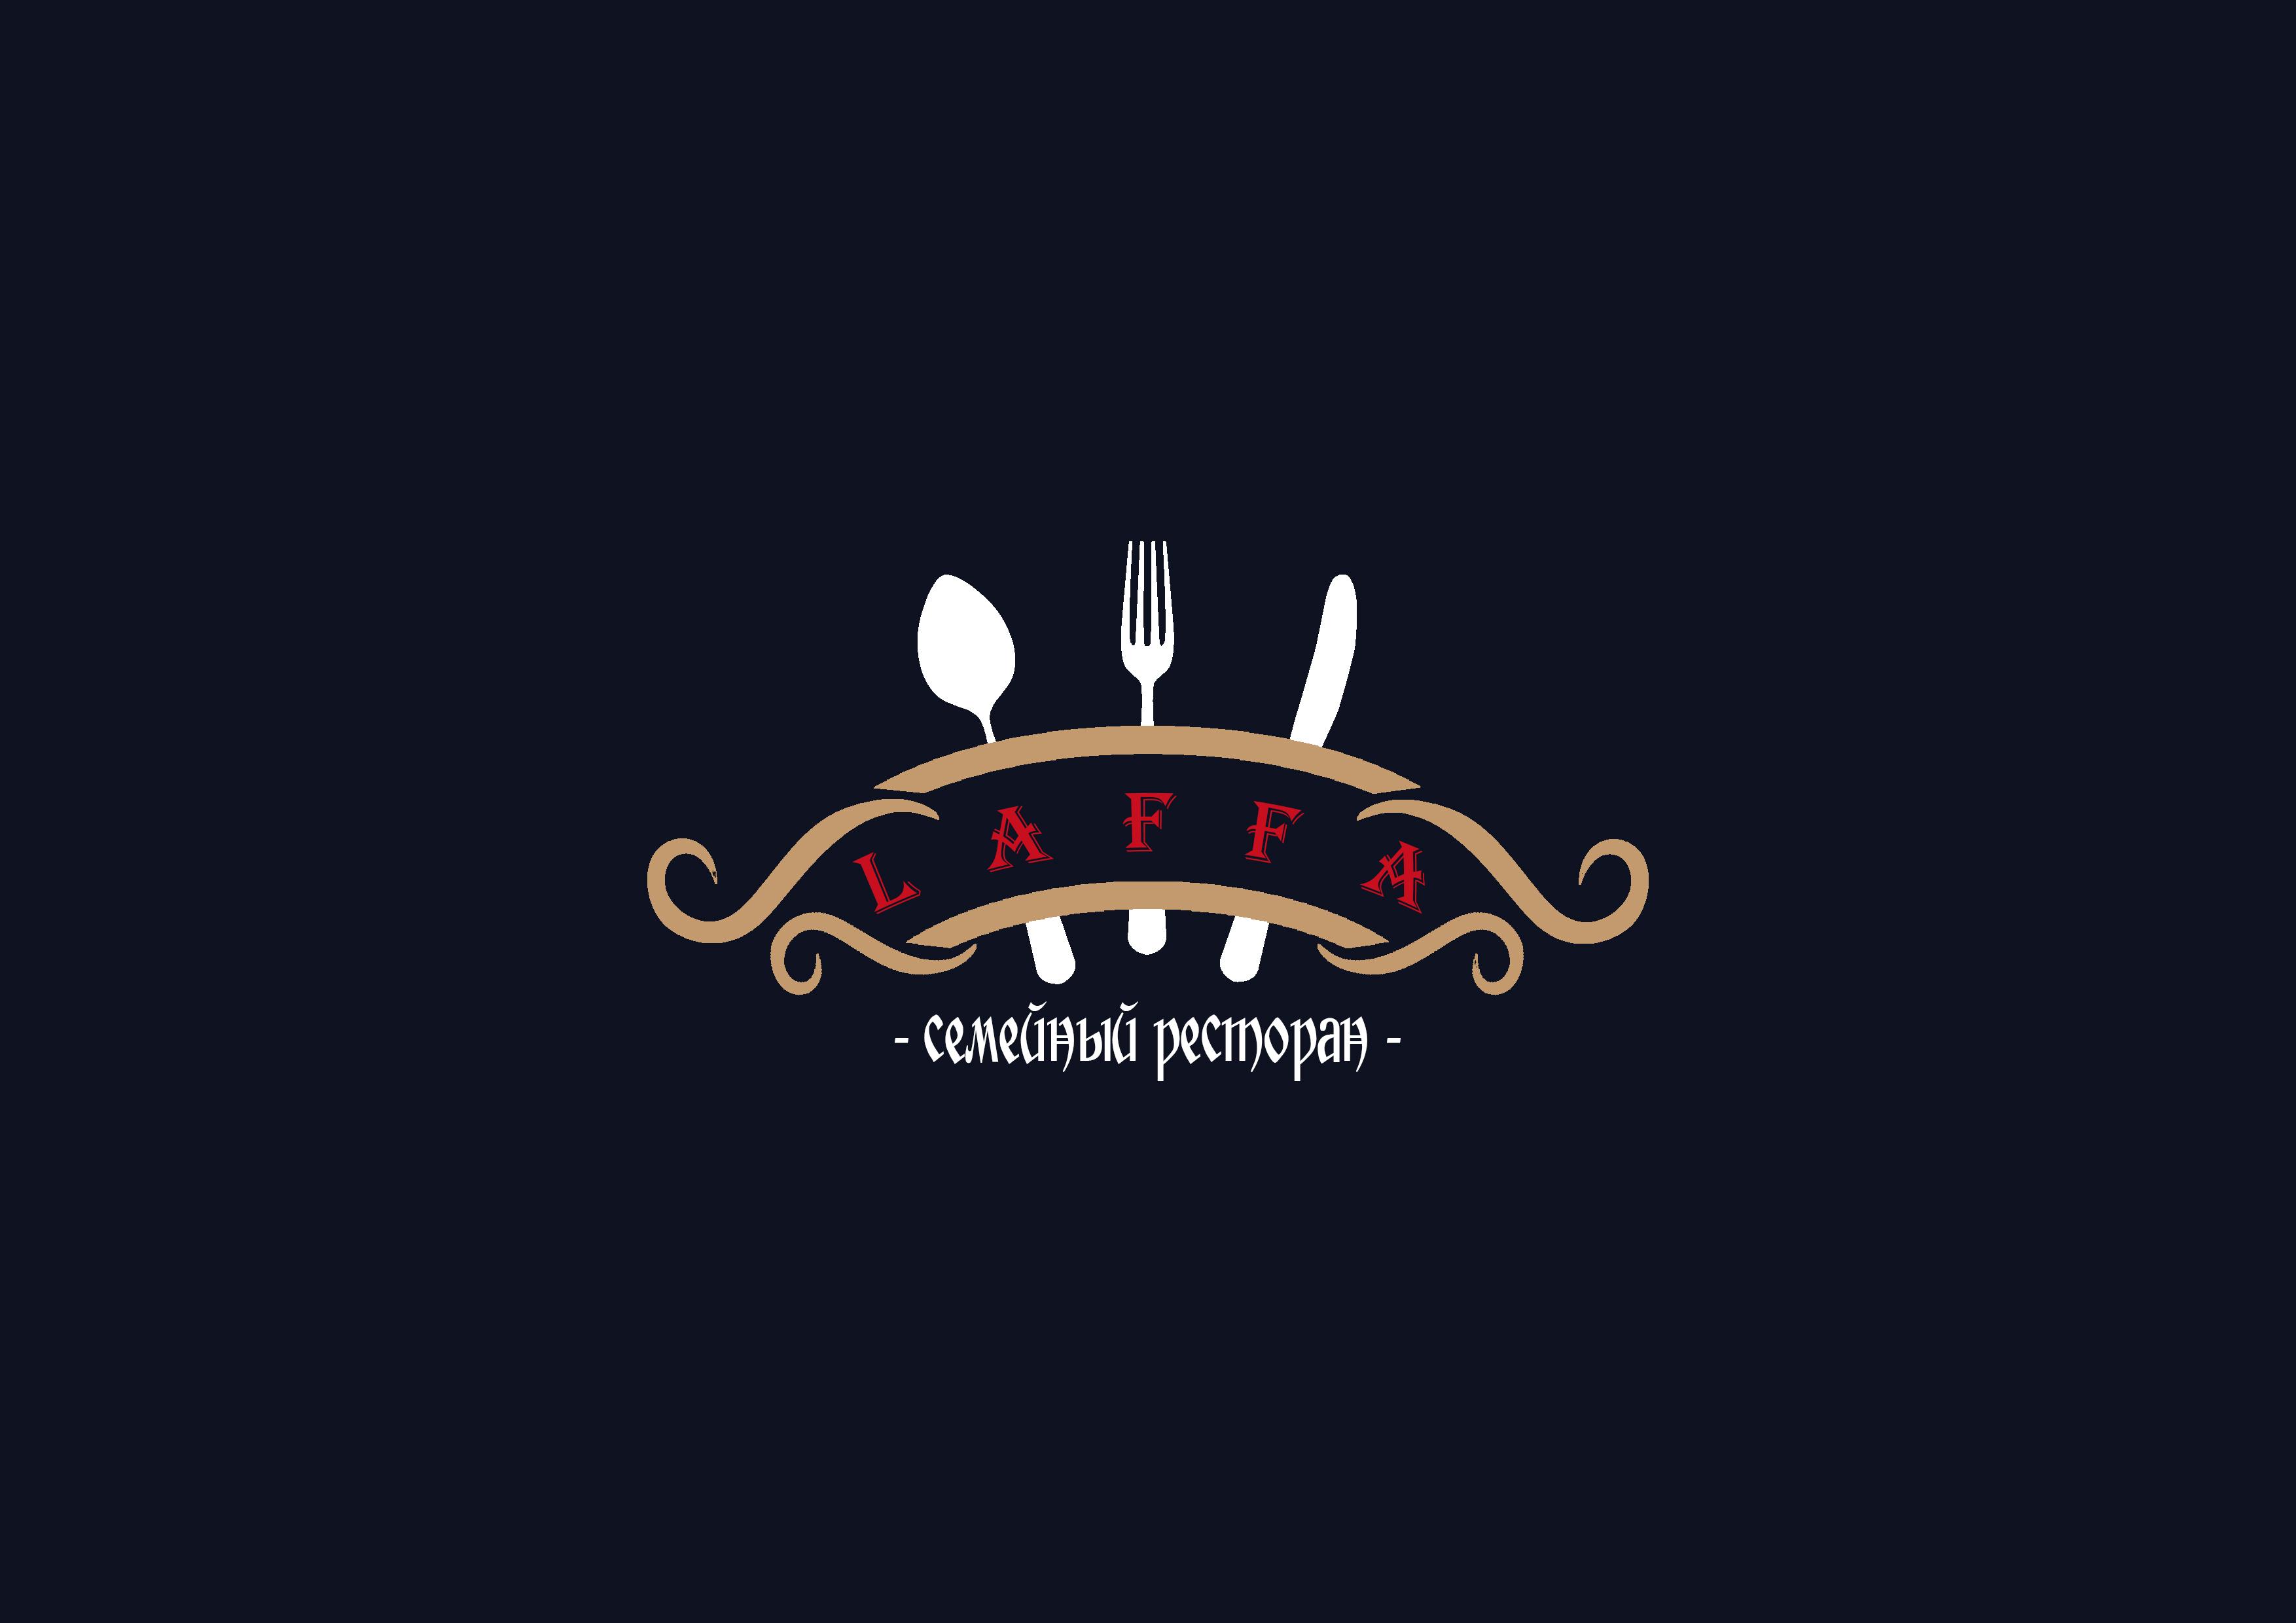 Нужно нарисовать логотип для семейного итальянского ресторан фото f_762554b15bd5b54a.jpg